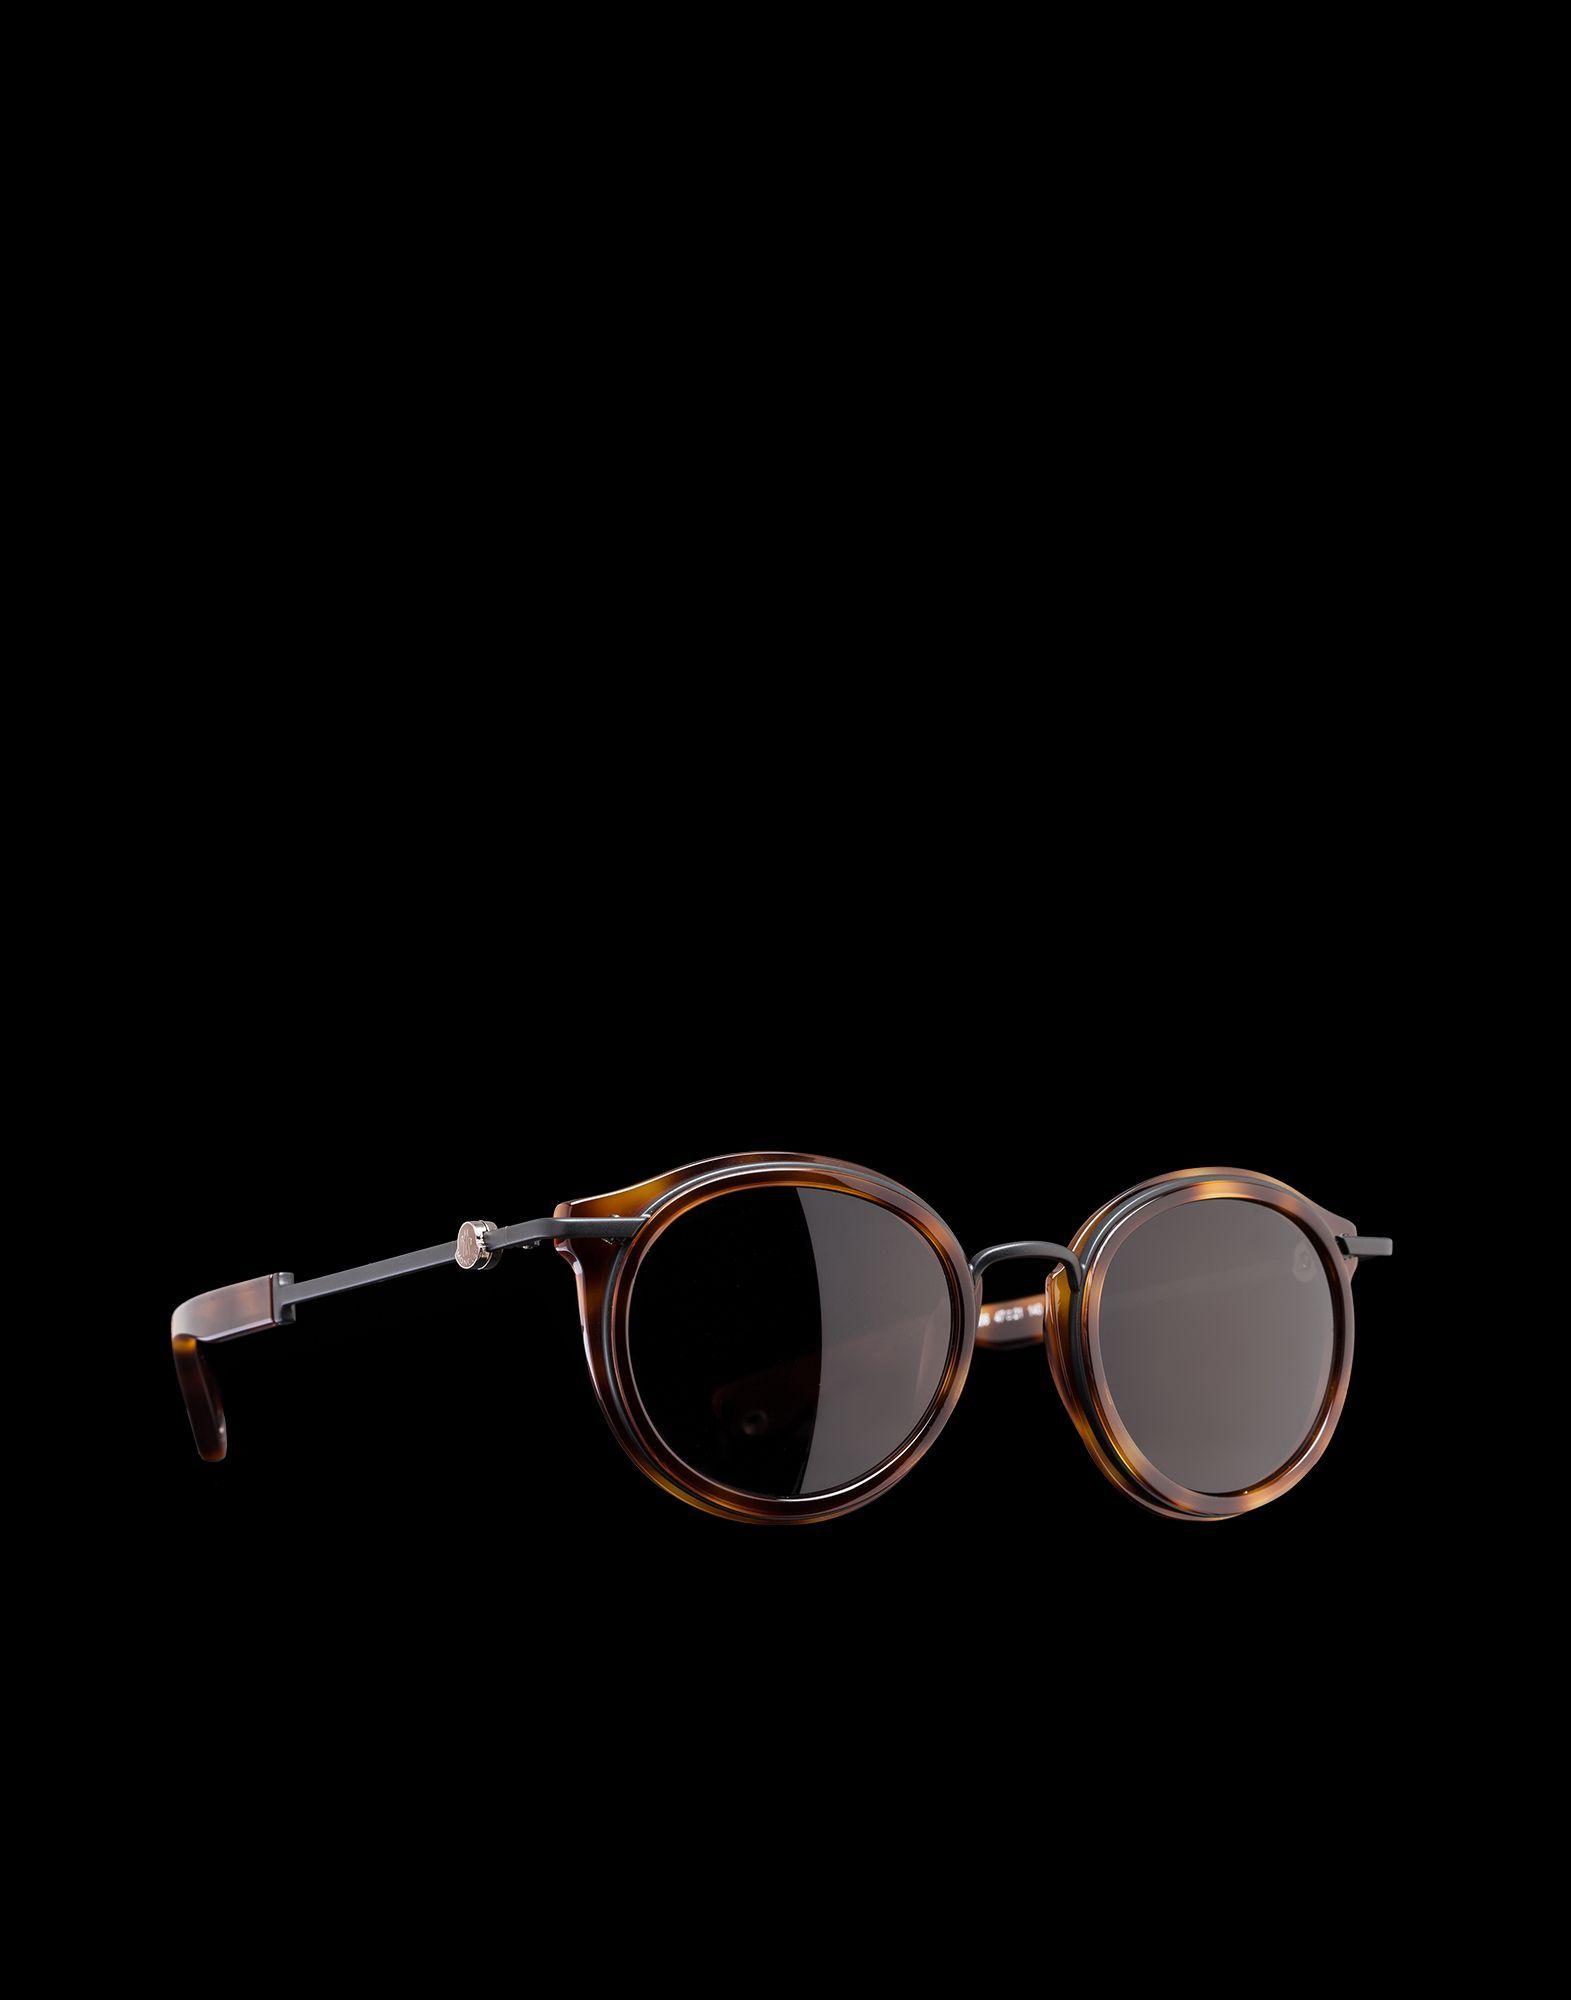 67e786c58e644 Eyewear Men Moncler - Original products on store.moncler.com  eyewear   fashion  men